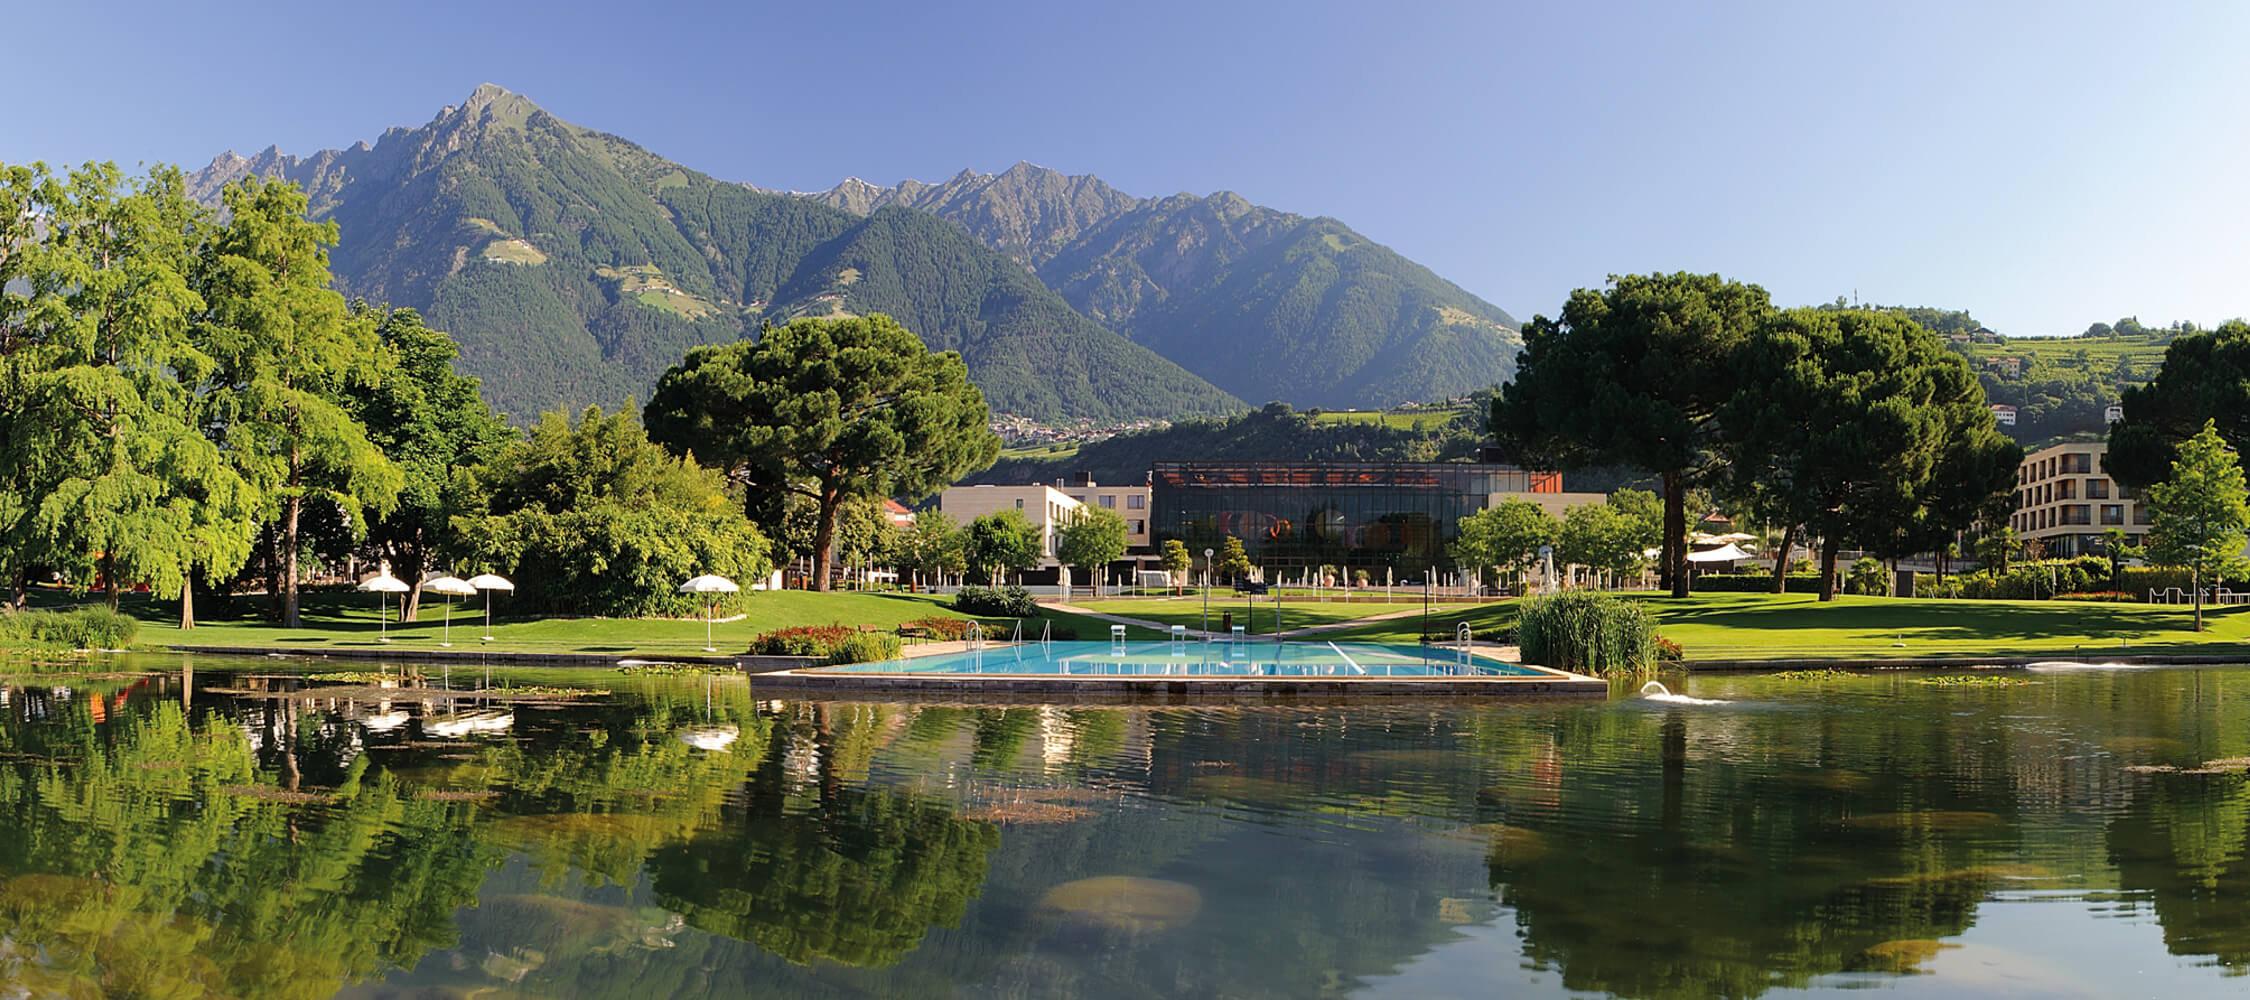 Italien-Trentino_Suedtirol_Alto_Adige_Merano_Meran_Therme_Pool_Aussen_Park_Wasser_Schwimmbad_Panorama_DOCsrl_2250x1000